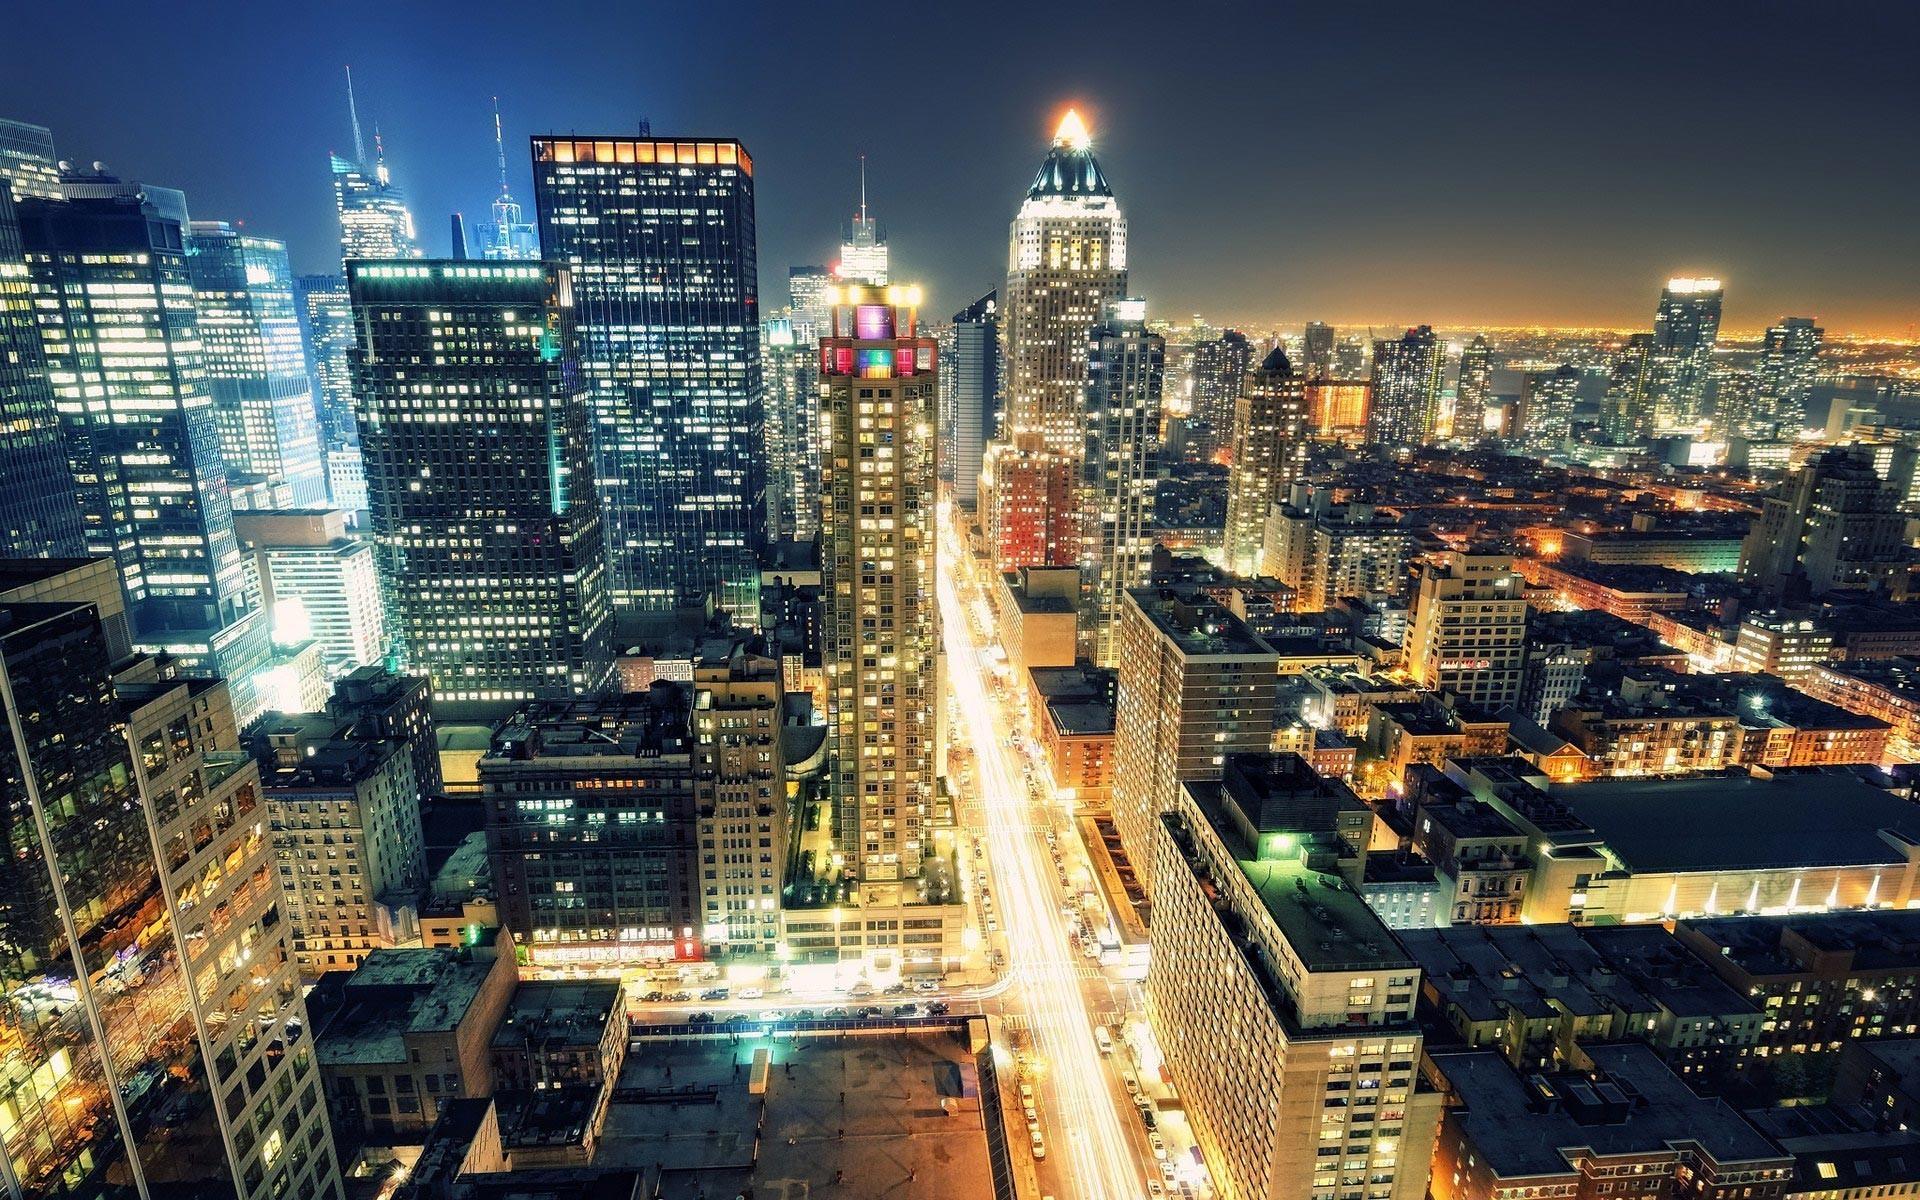 New York City Skyline Drawing. City Skyline Night Drawing Full Hd Wallpapers  Wallpaper 1920x1200px